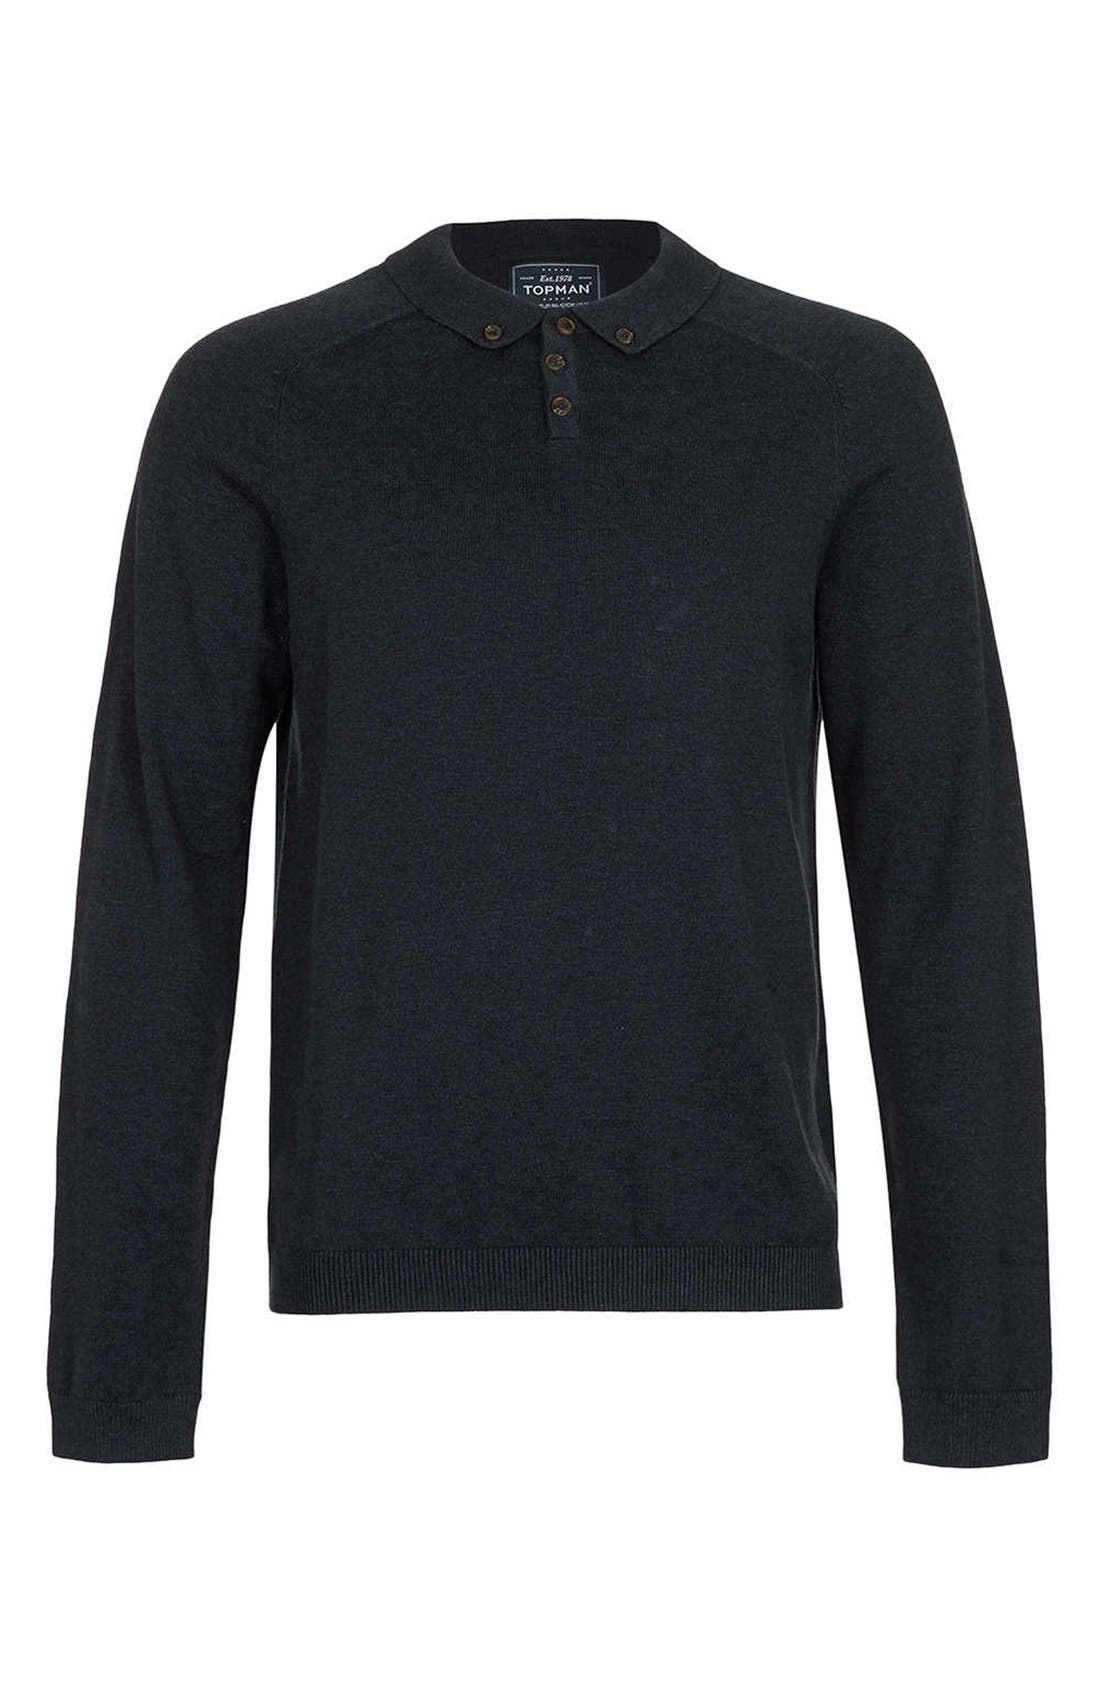 Alternate Image 1 Selected - Topman Long Sleeve Knit Polo